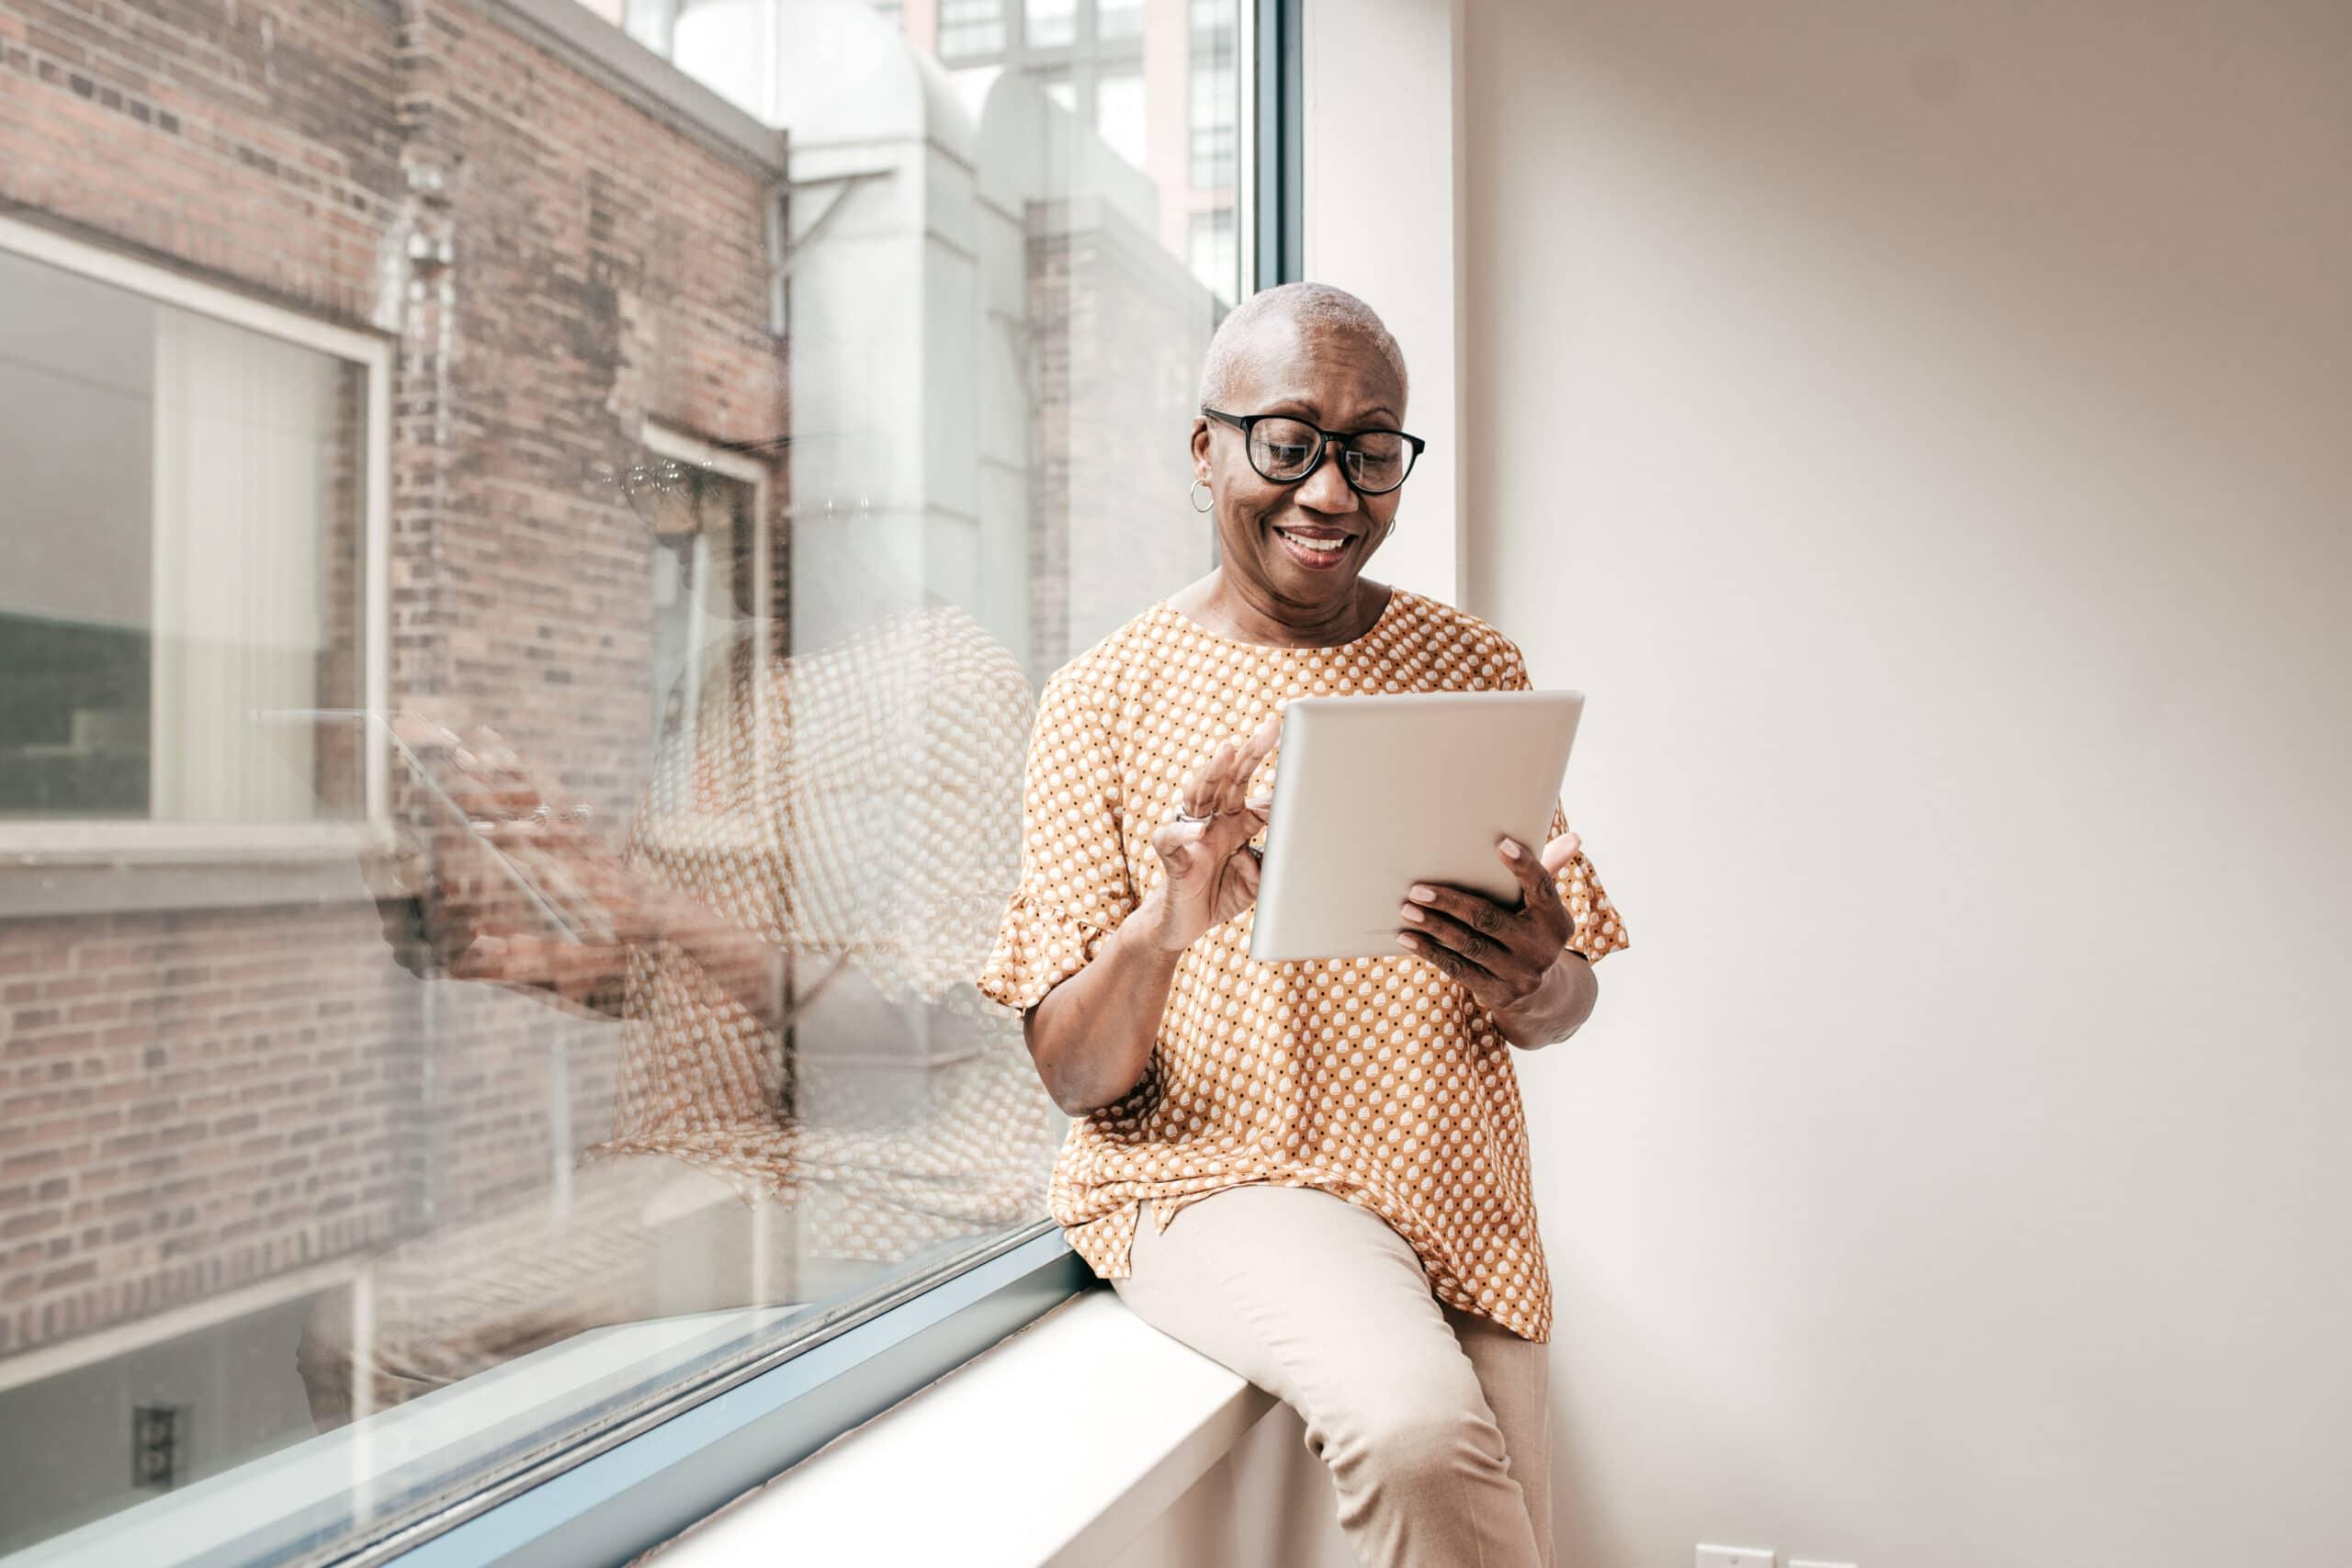 Smiling Senior Woman Reading Newspaper